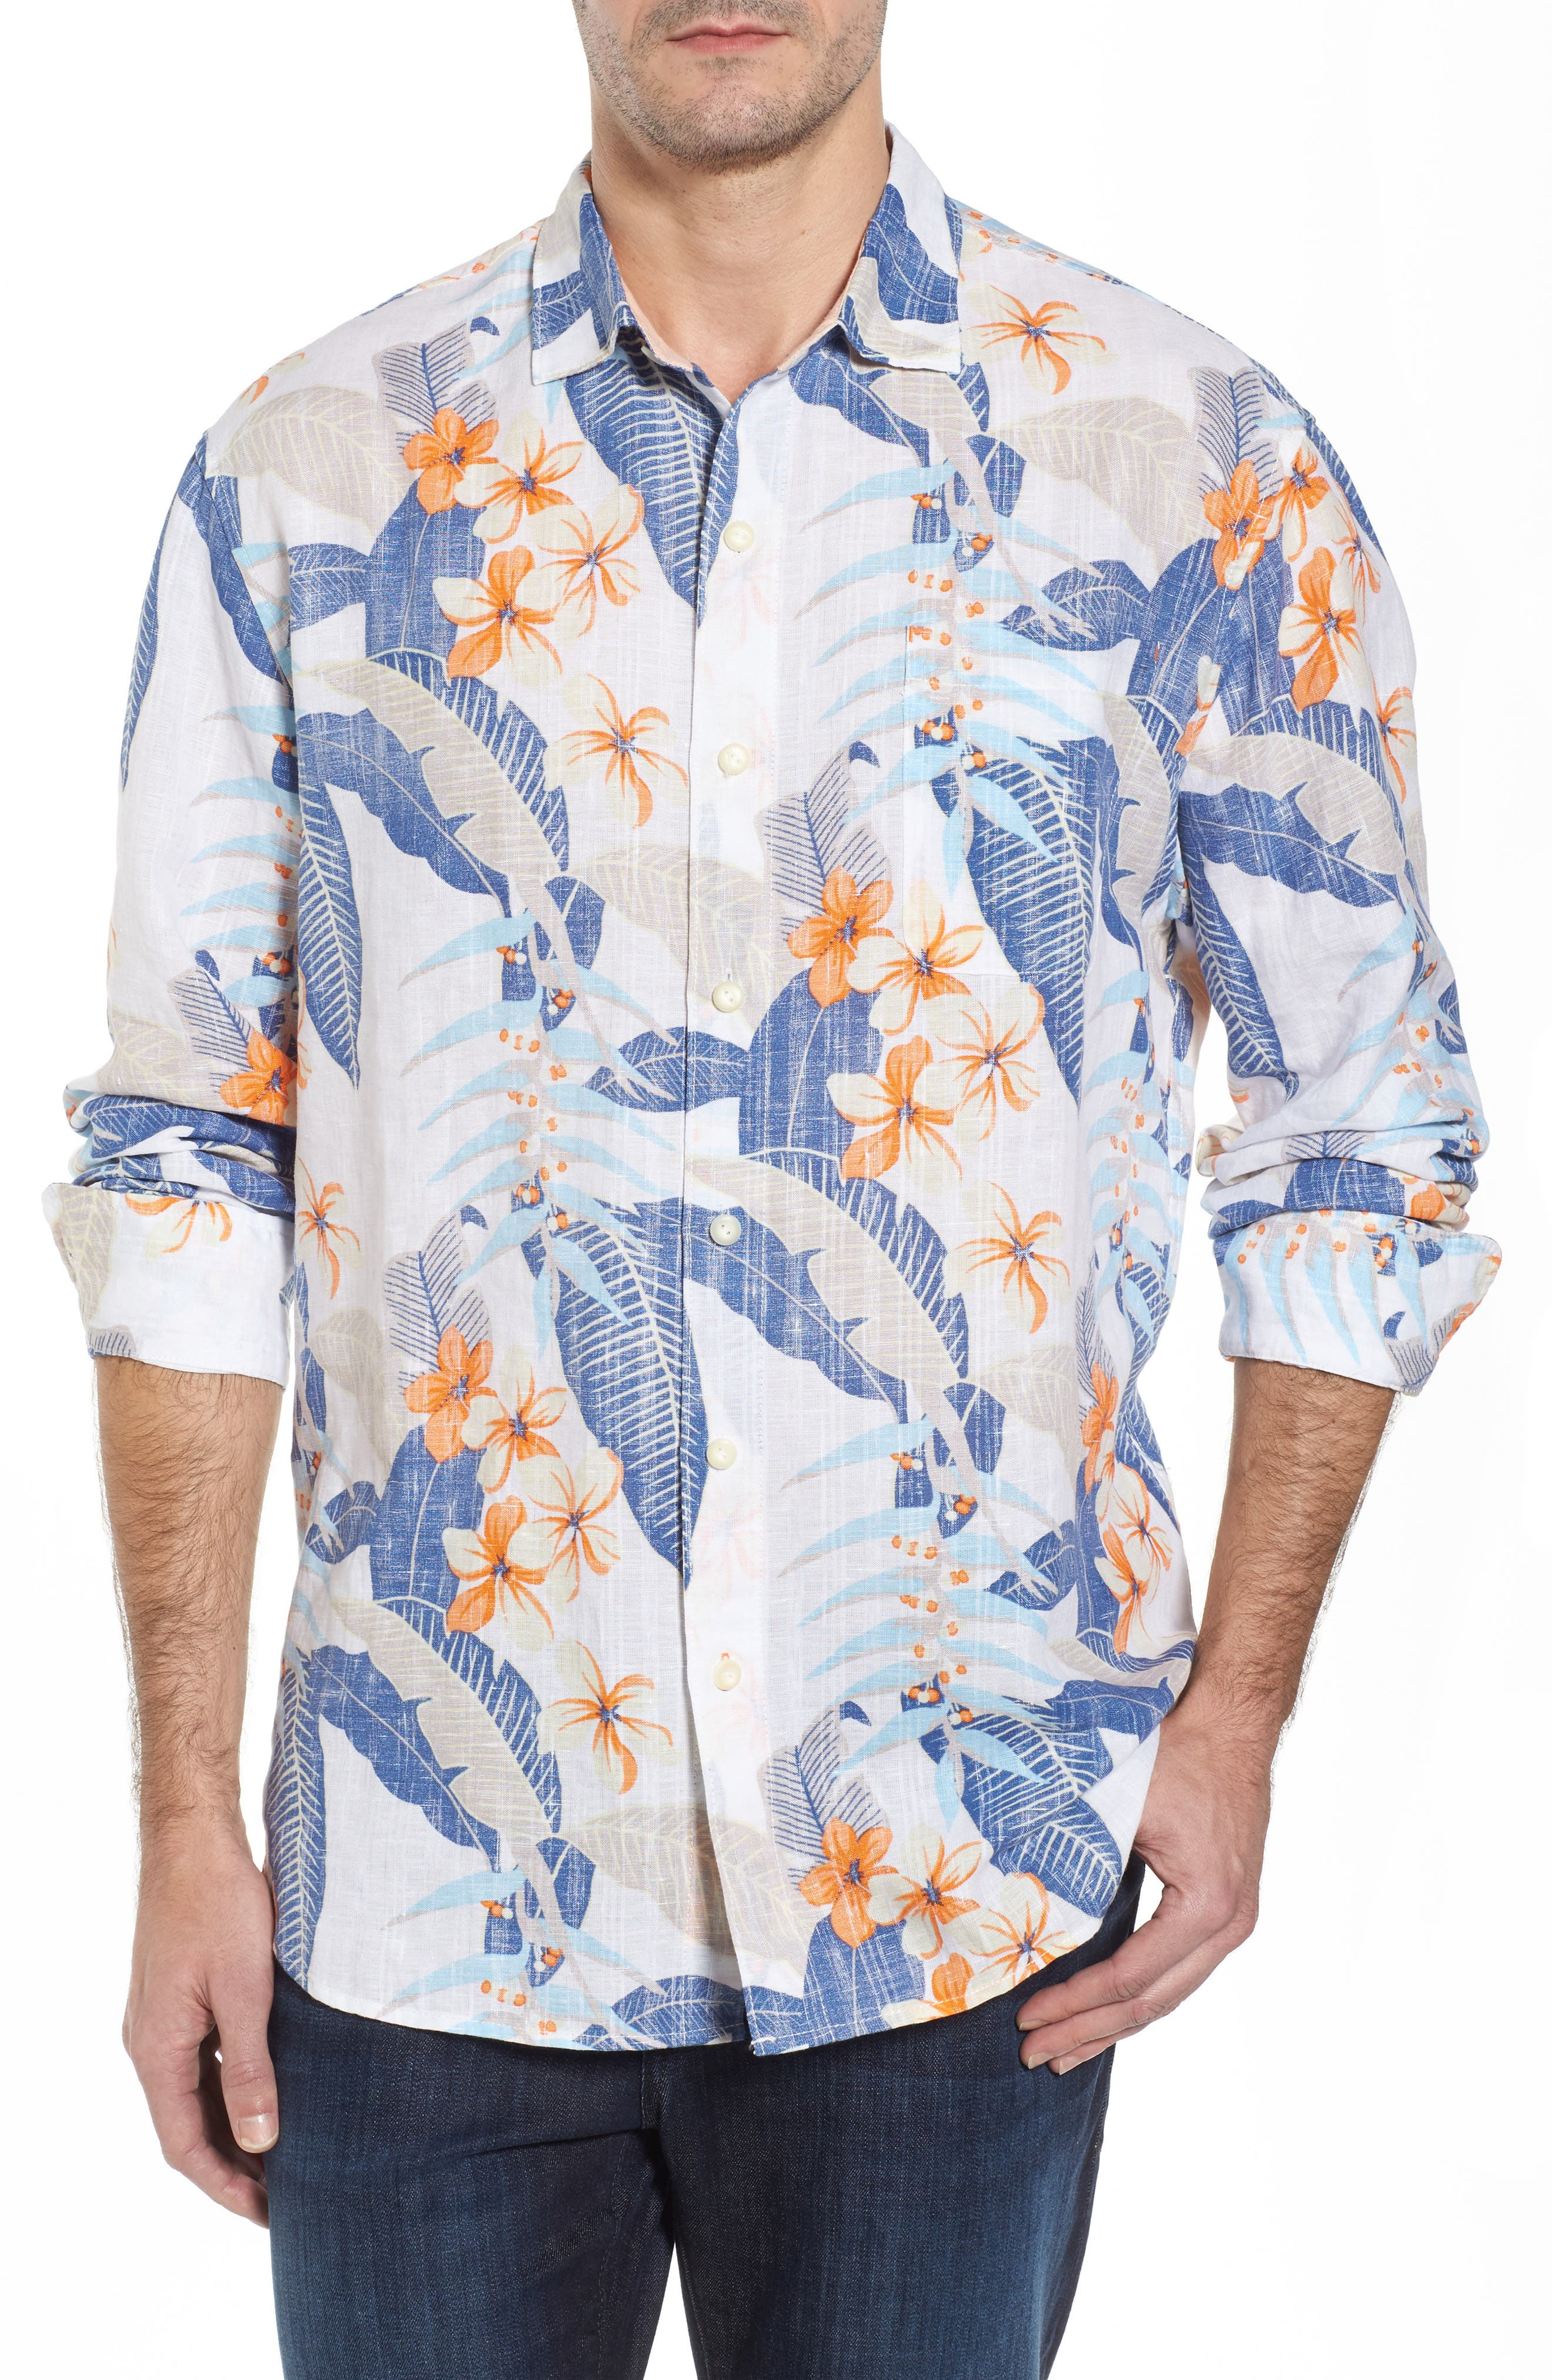 Liviea Leaves Linen Blend Camp Shirt,                             Main thumbnail 1, color,                             100